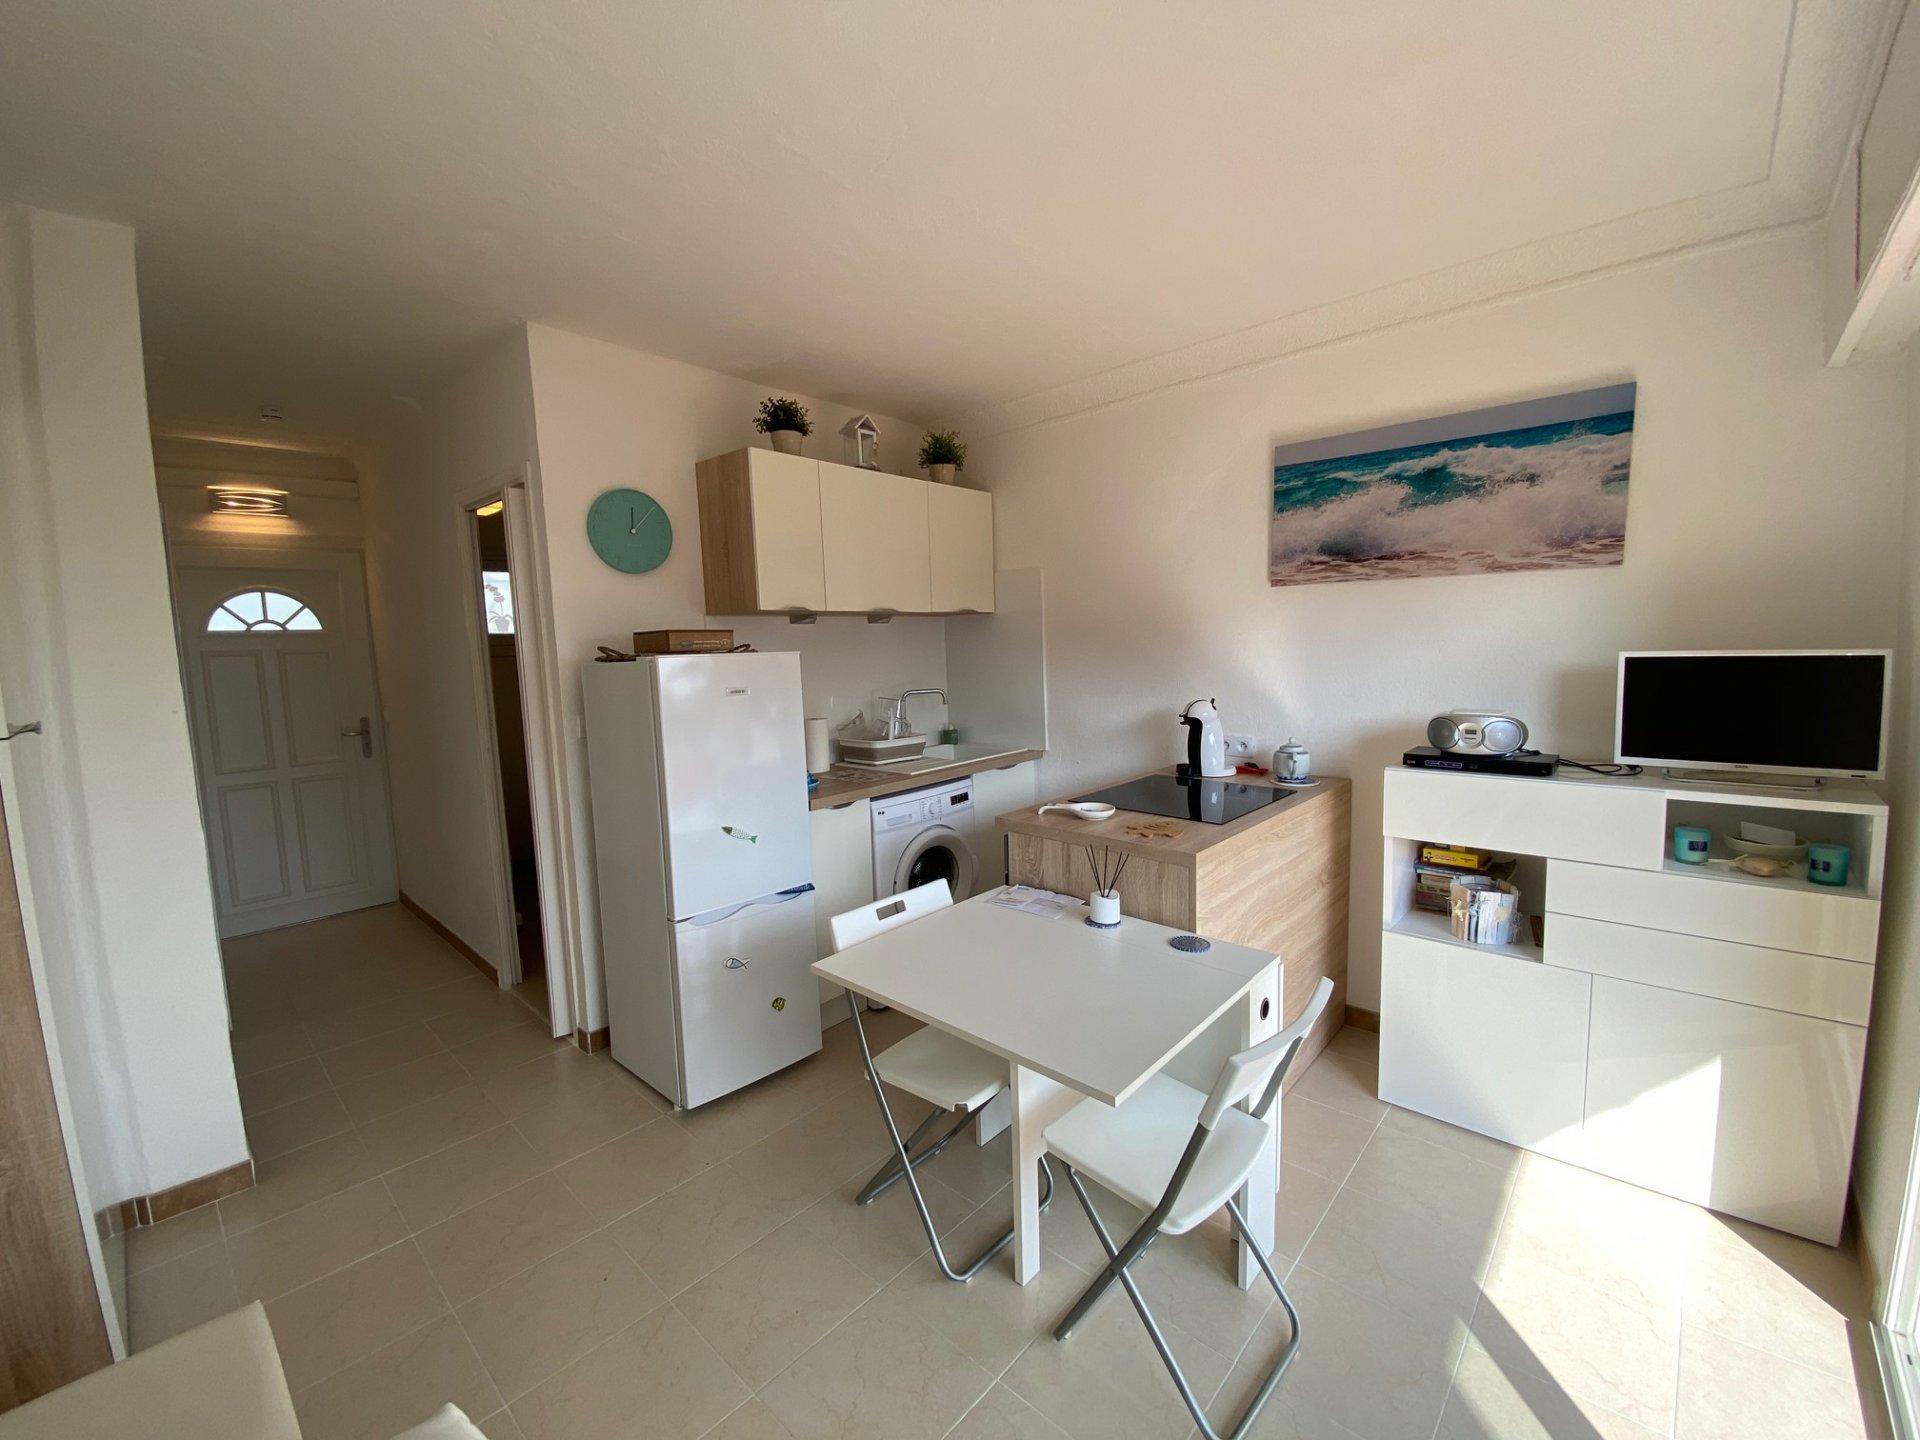 Sale Apartment - Antibes Route de Nice